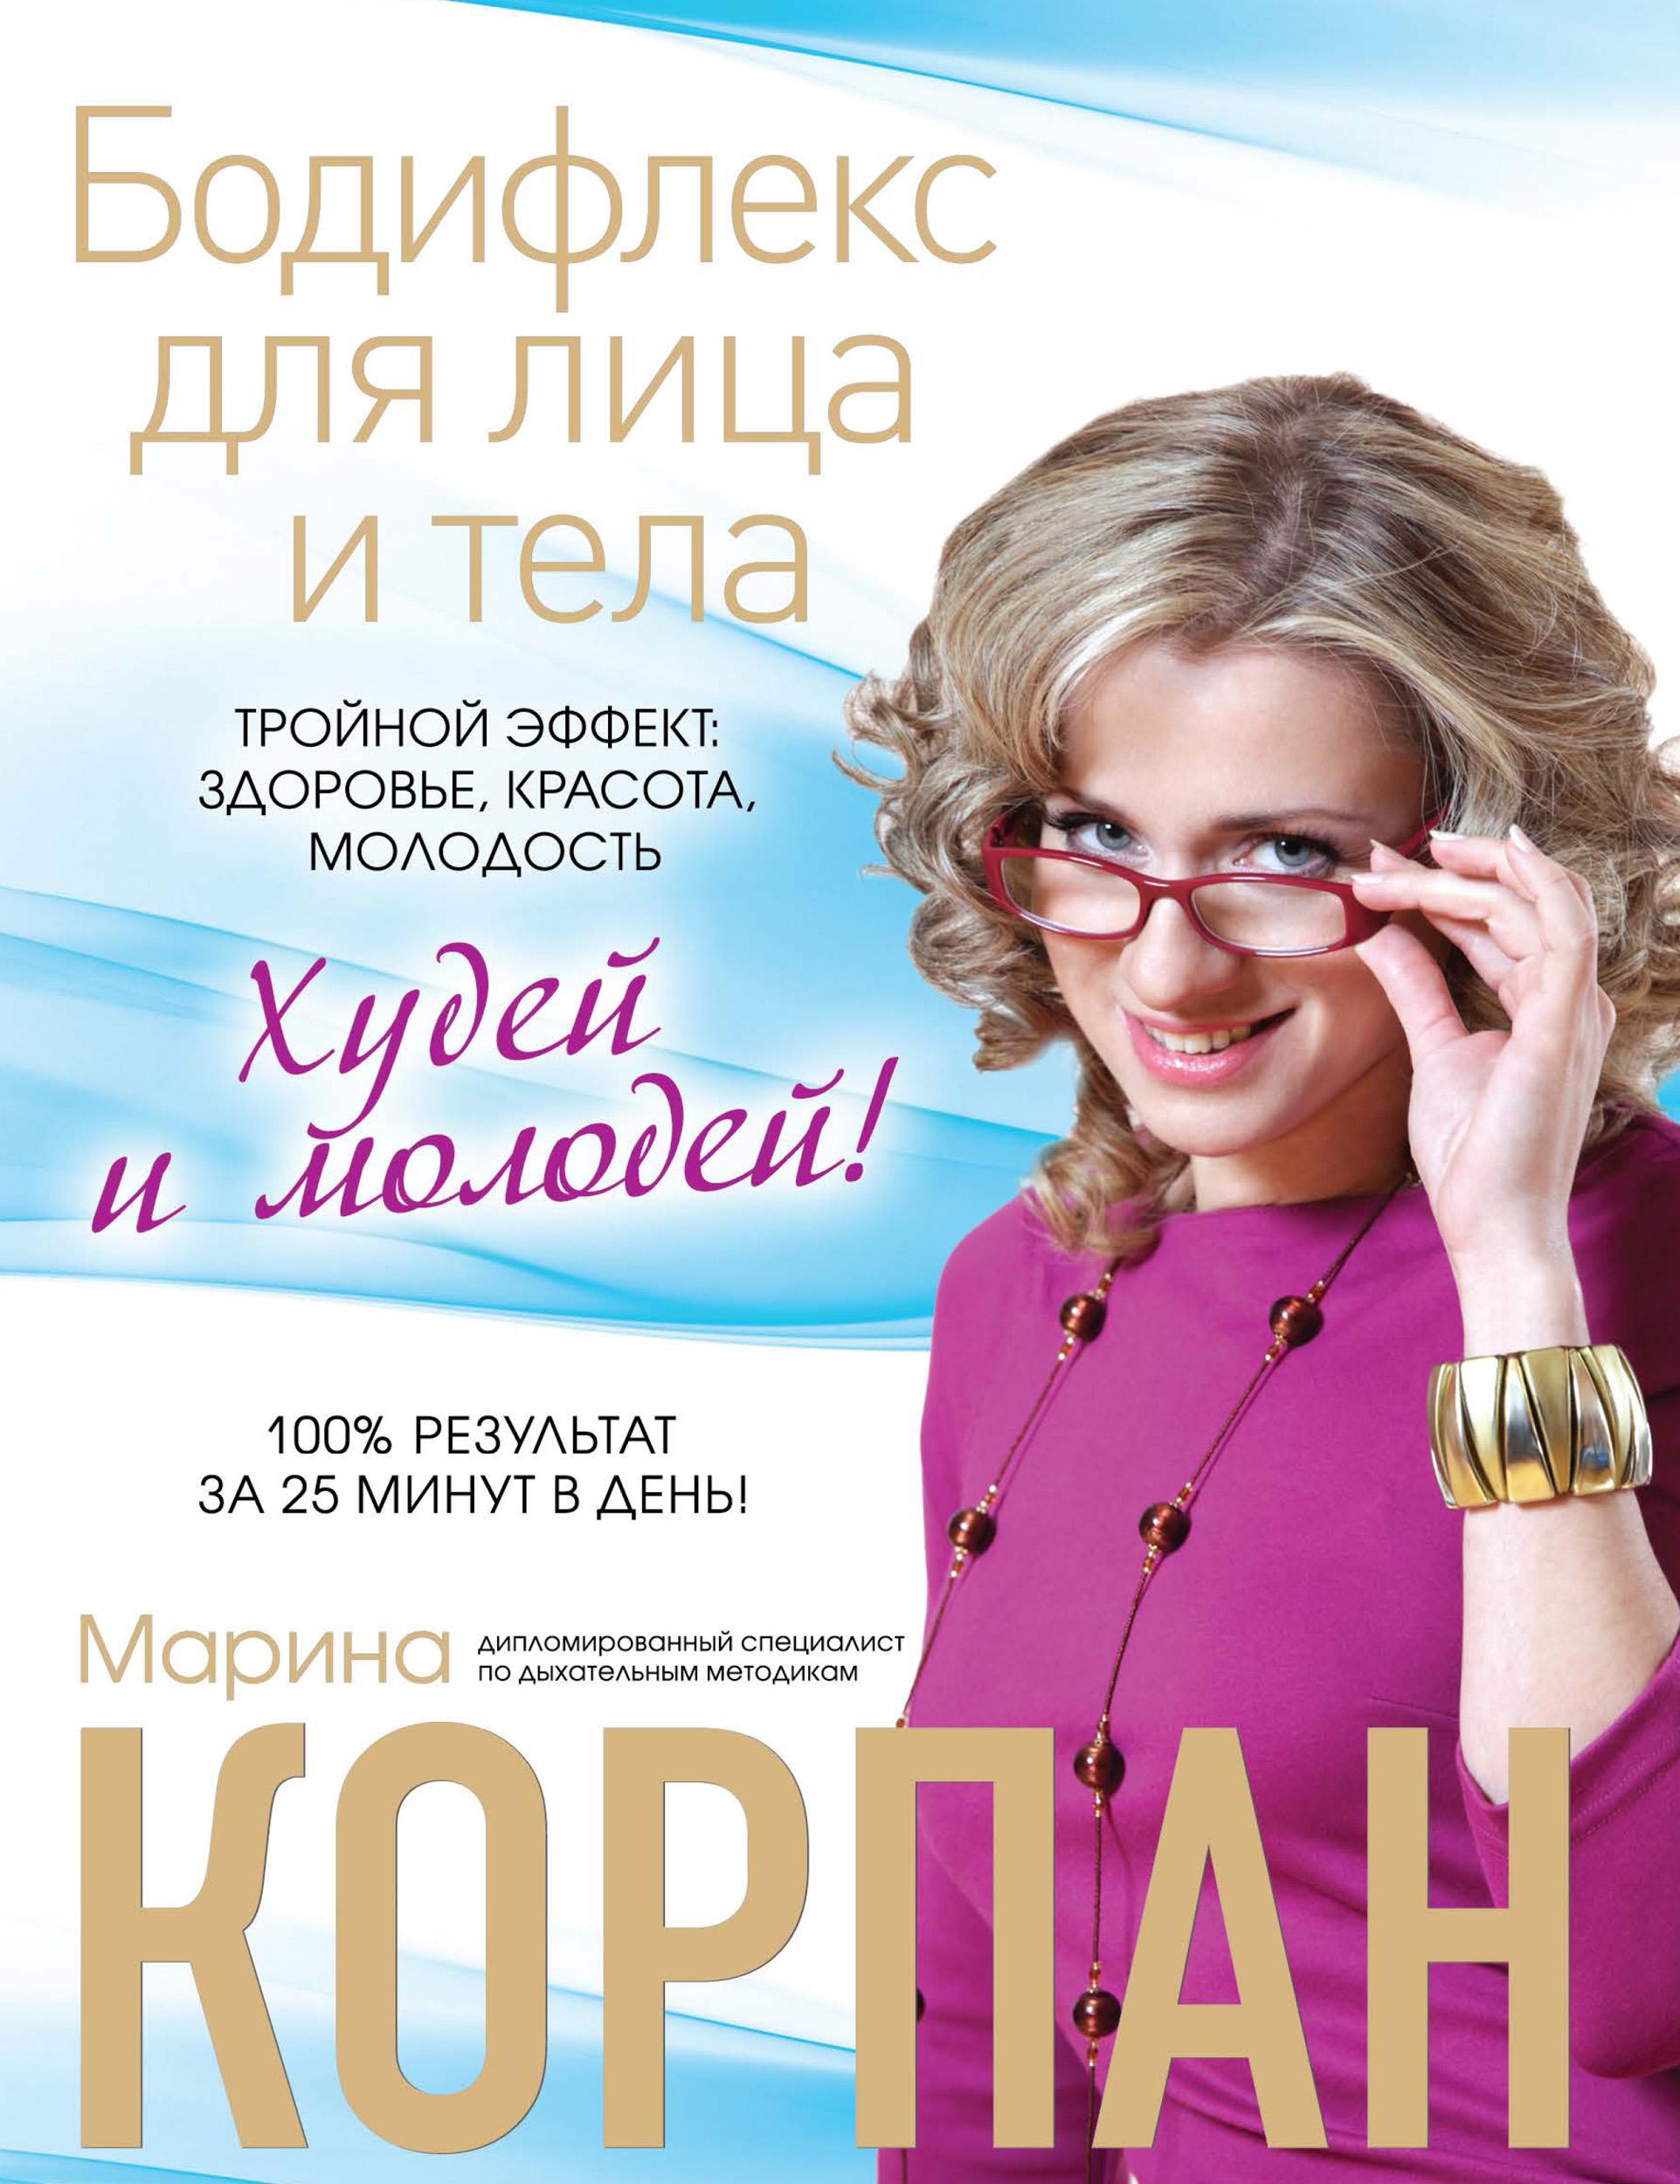 Марина Корпан Бодифлекс для лица и тела корпан м бодифлекс для лица и тела подарочное издание